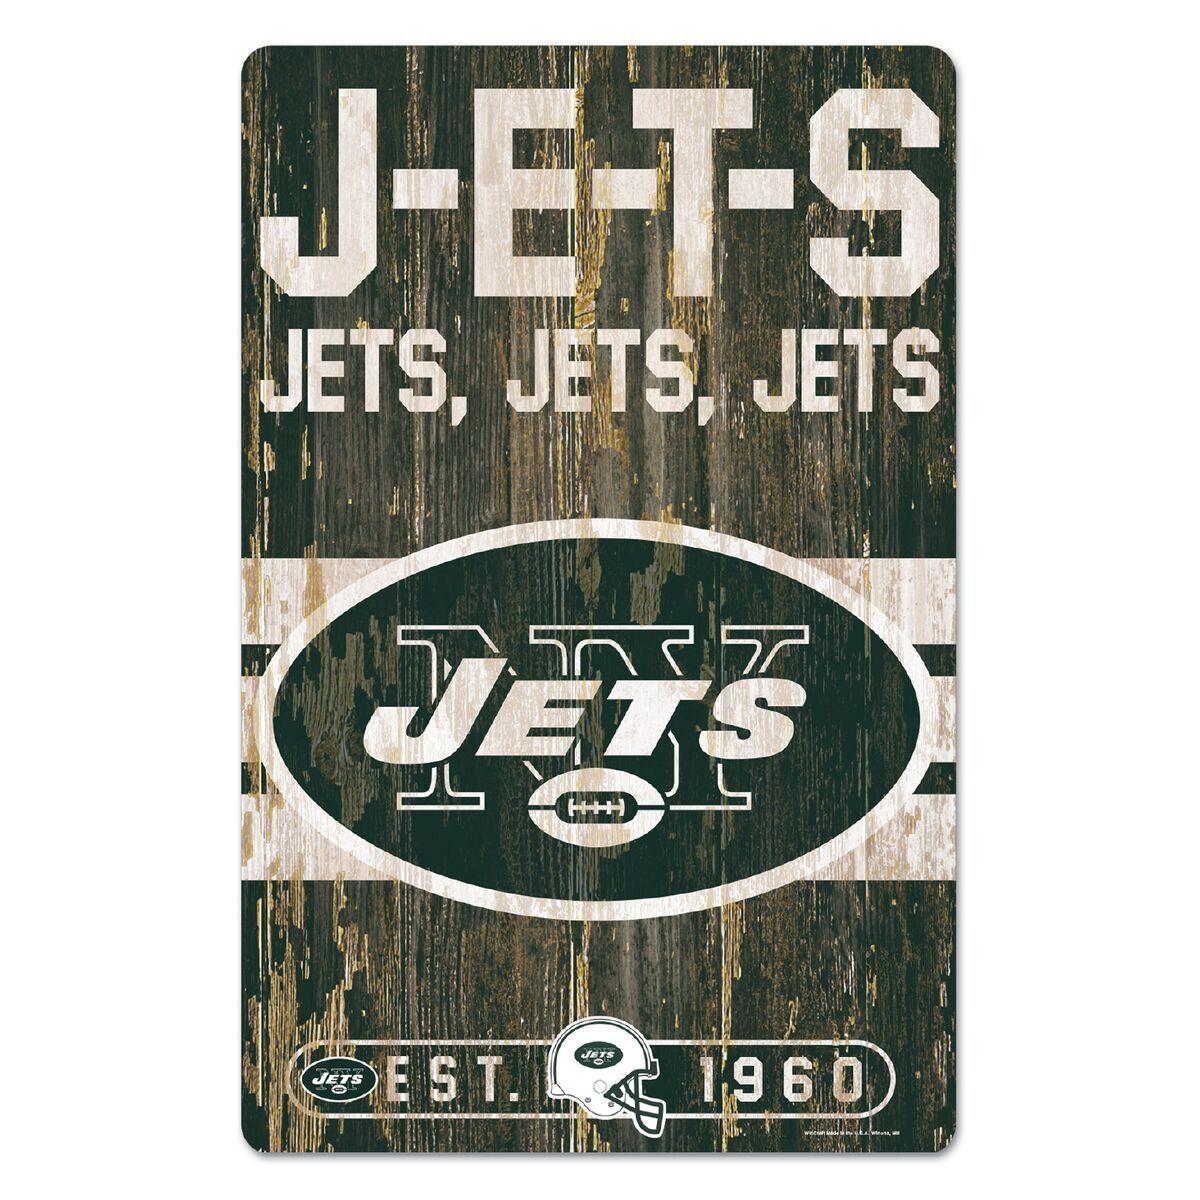 NFL Football New York Jets NY Slogan Wood Sign Holzschild Holz Wandschmuck Deko